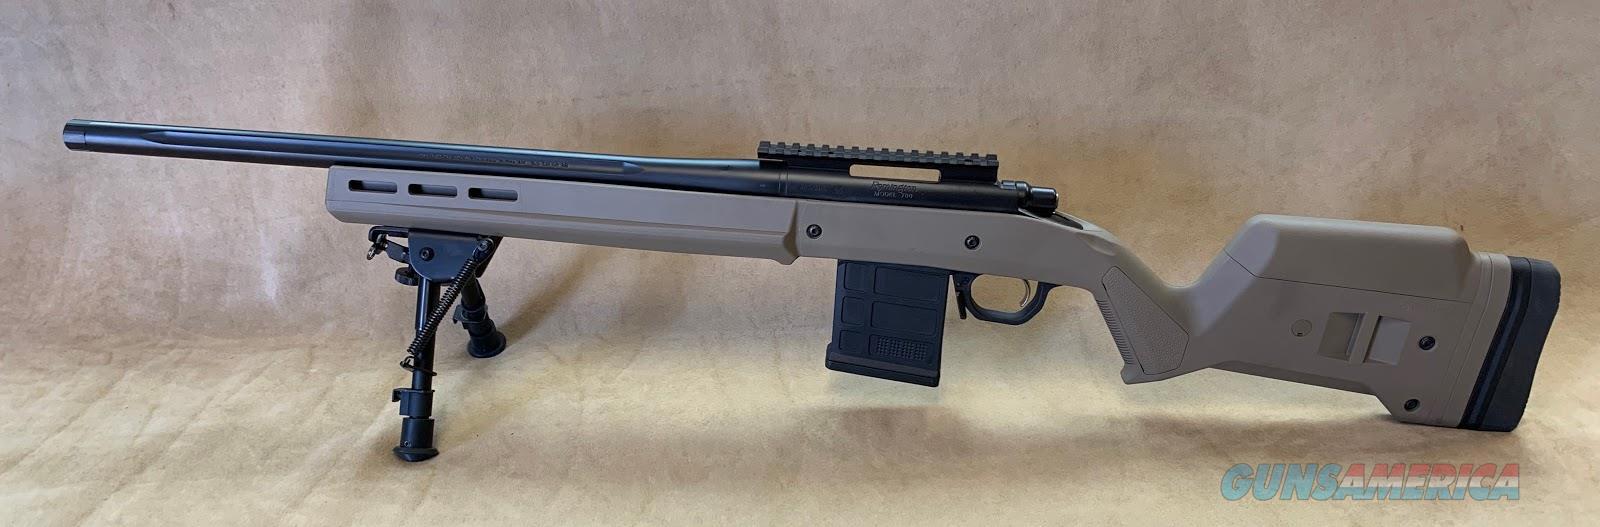 Remington 84302 700 Magpul 6.5 Creedmoor Used As New  Guns > Rifles > Remington Rifles - Modern > Model 700 > Tactical